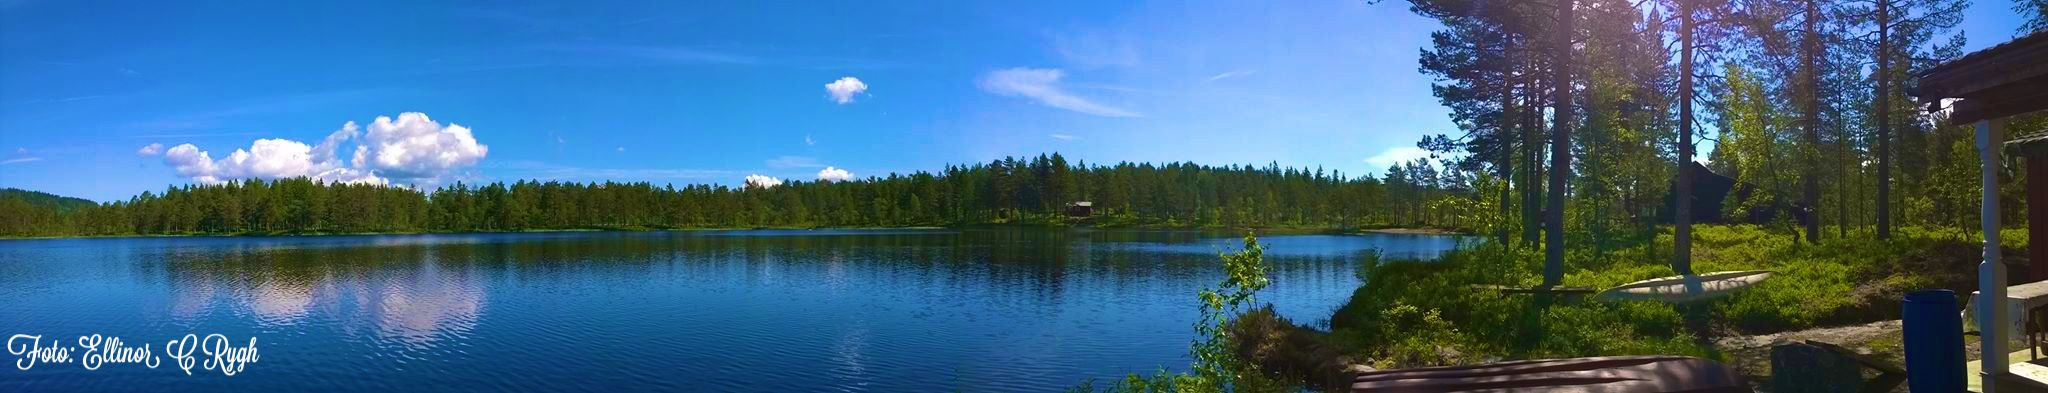 @ the cabin Photo by Ellinor C O Rygh